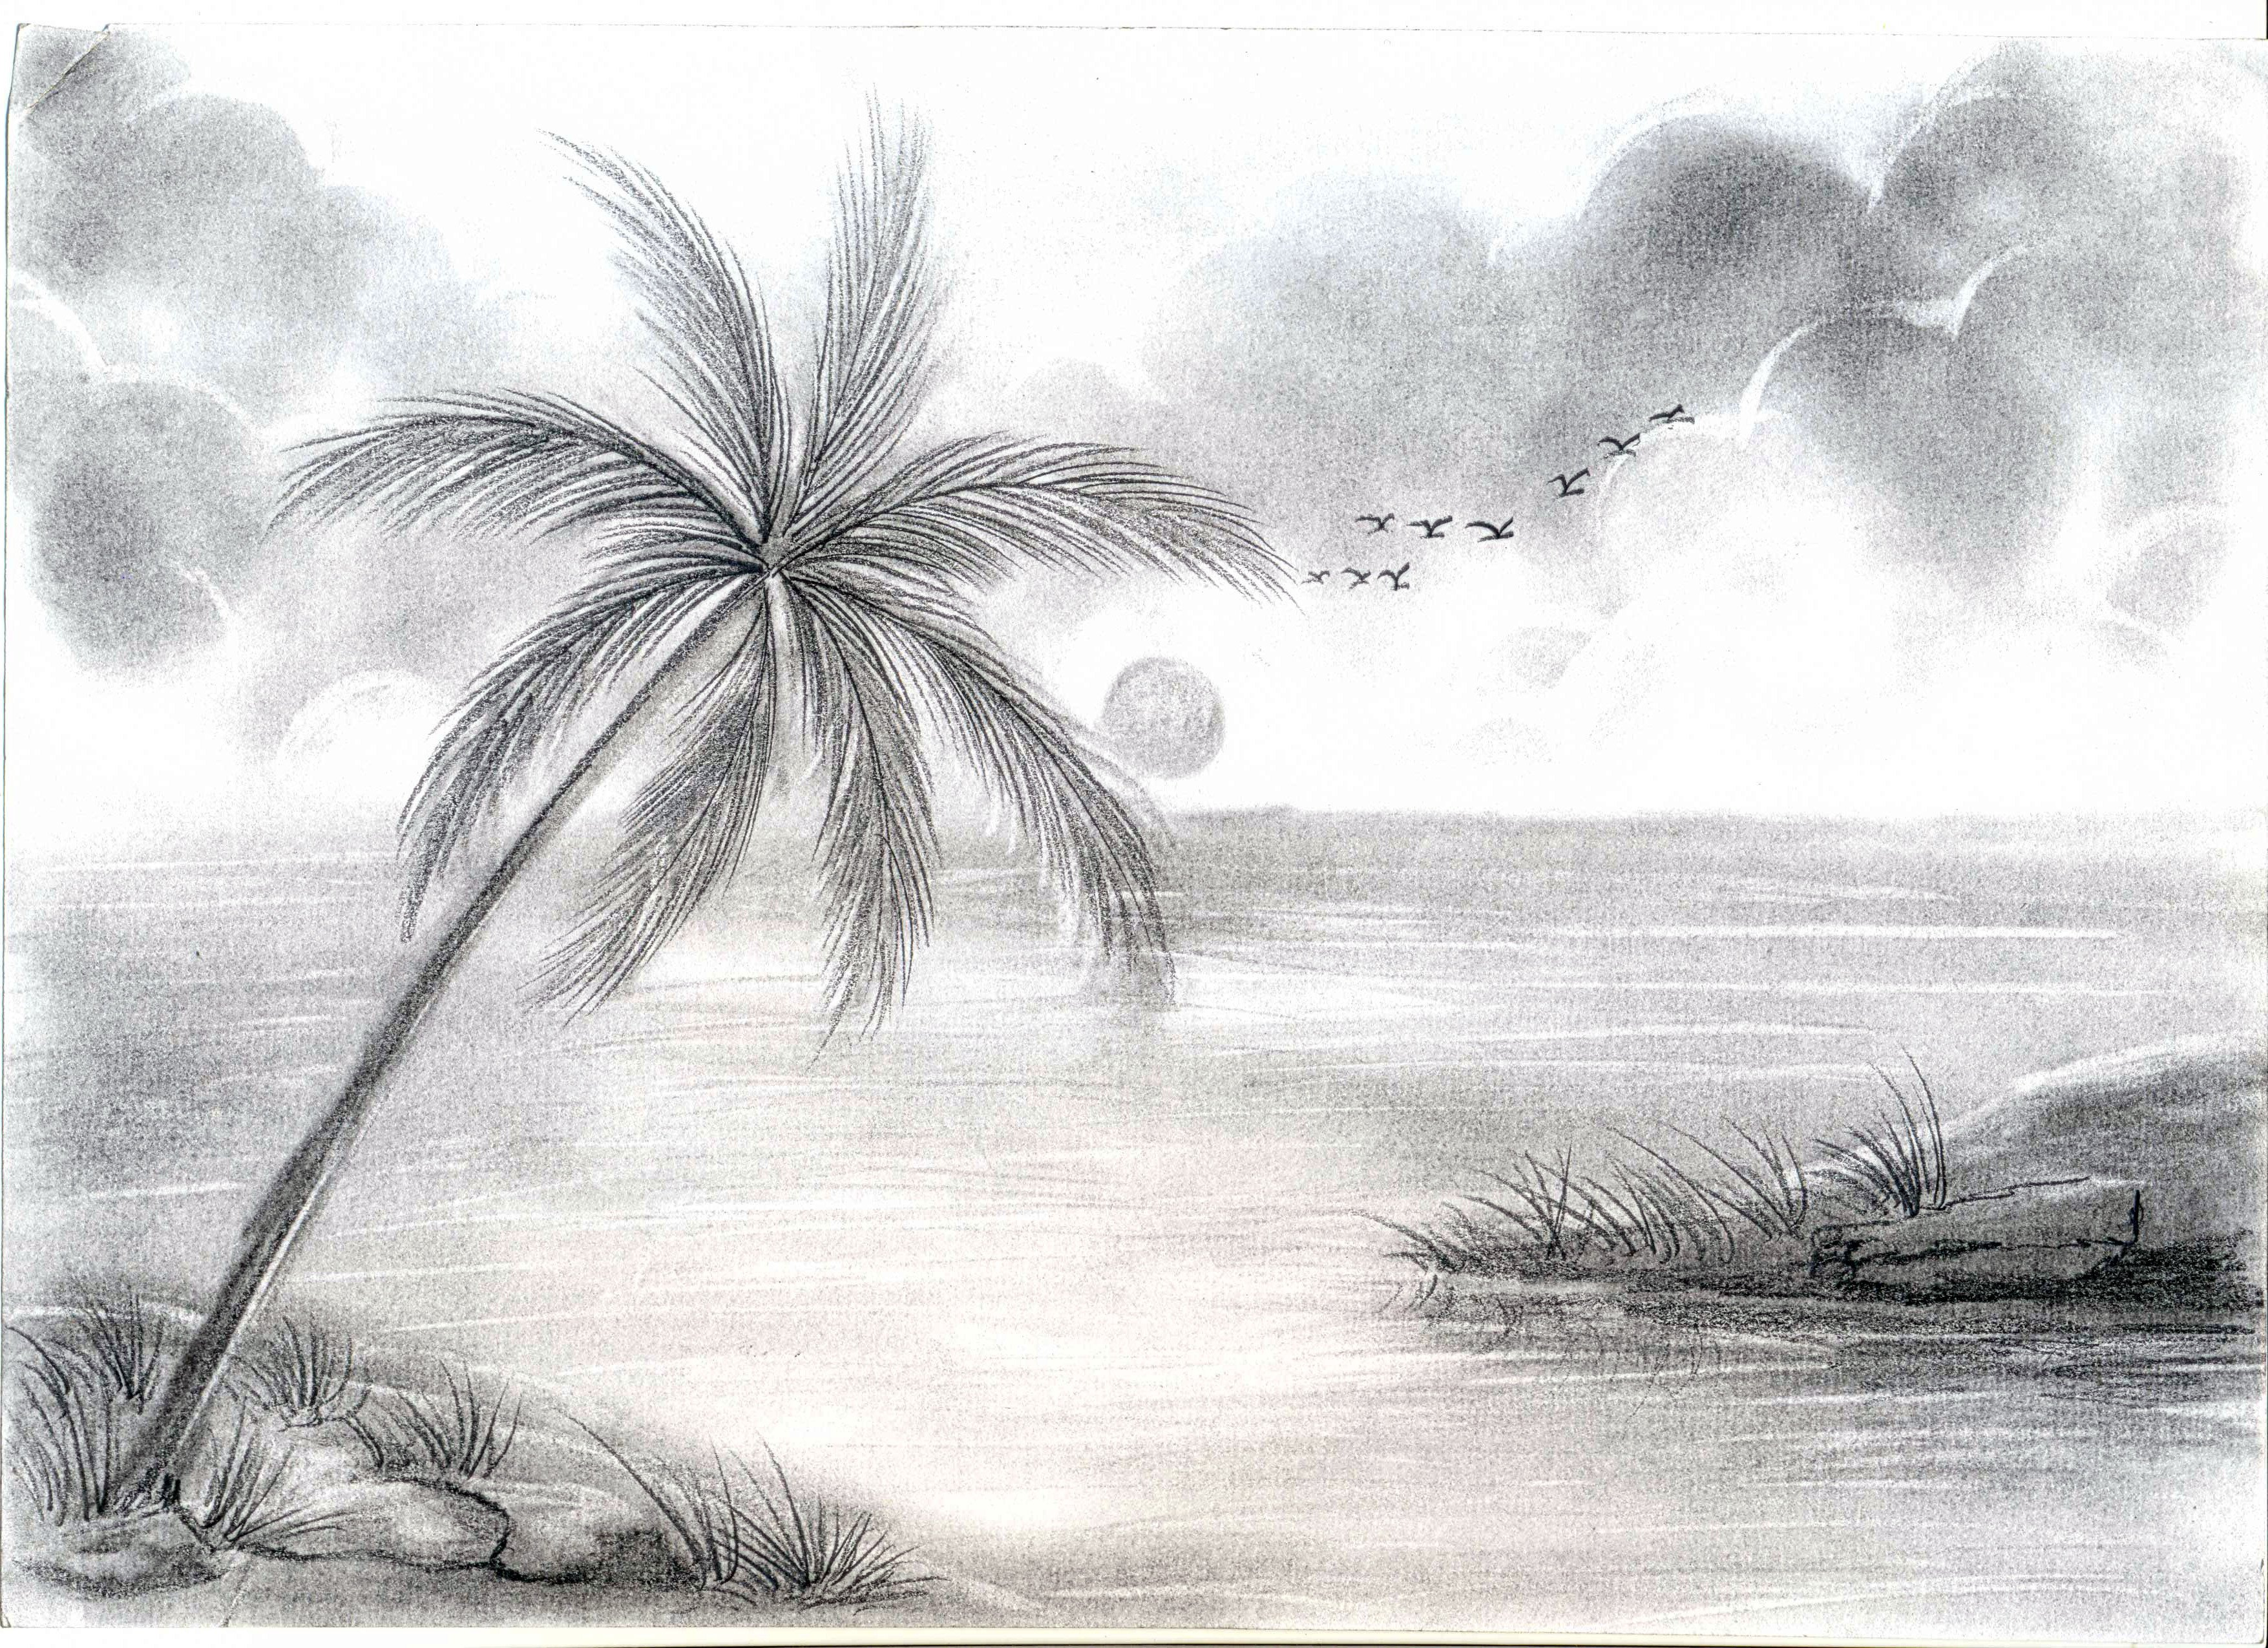 Beautiful Drawings Of Nature Pencil Sketchings Nature Nature Pencil Sketch Drawing